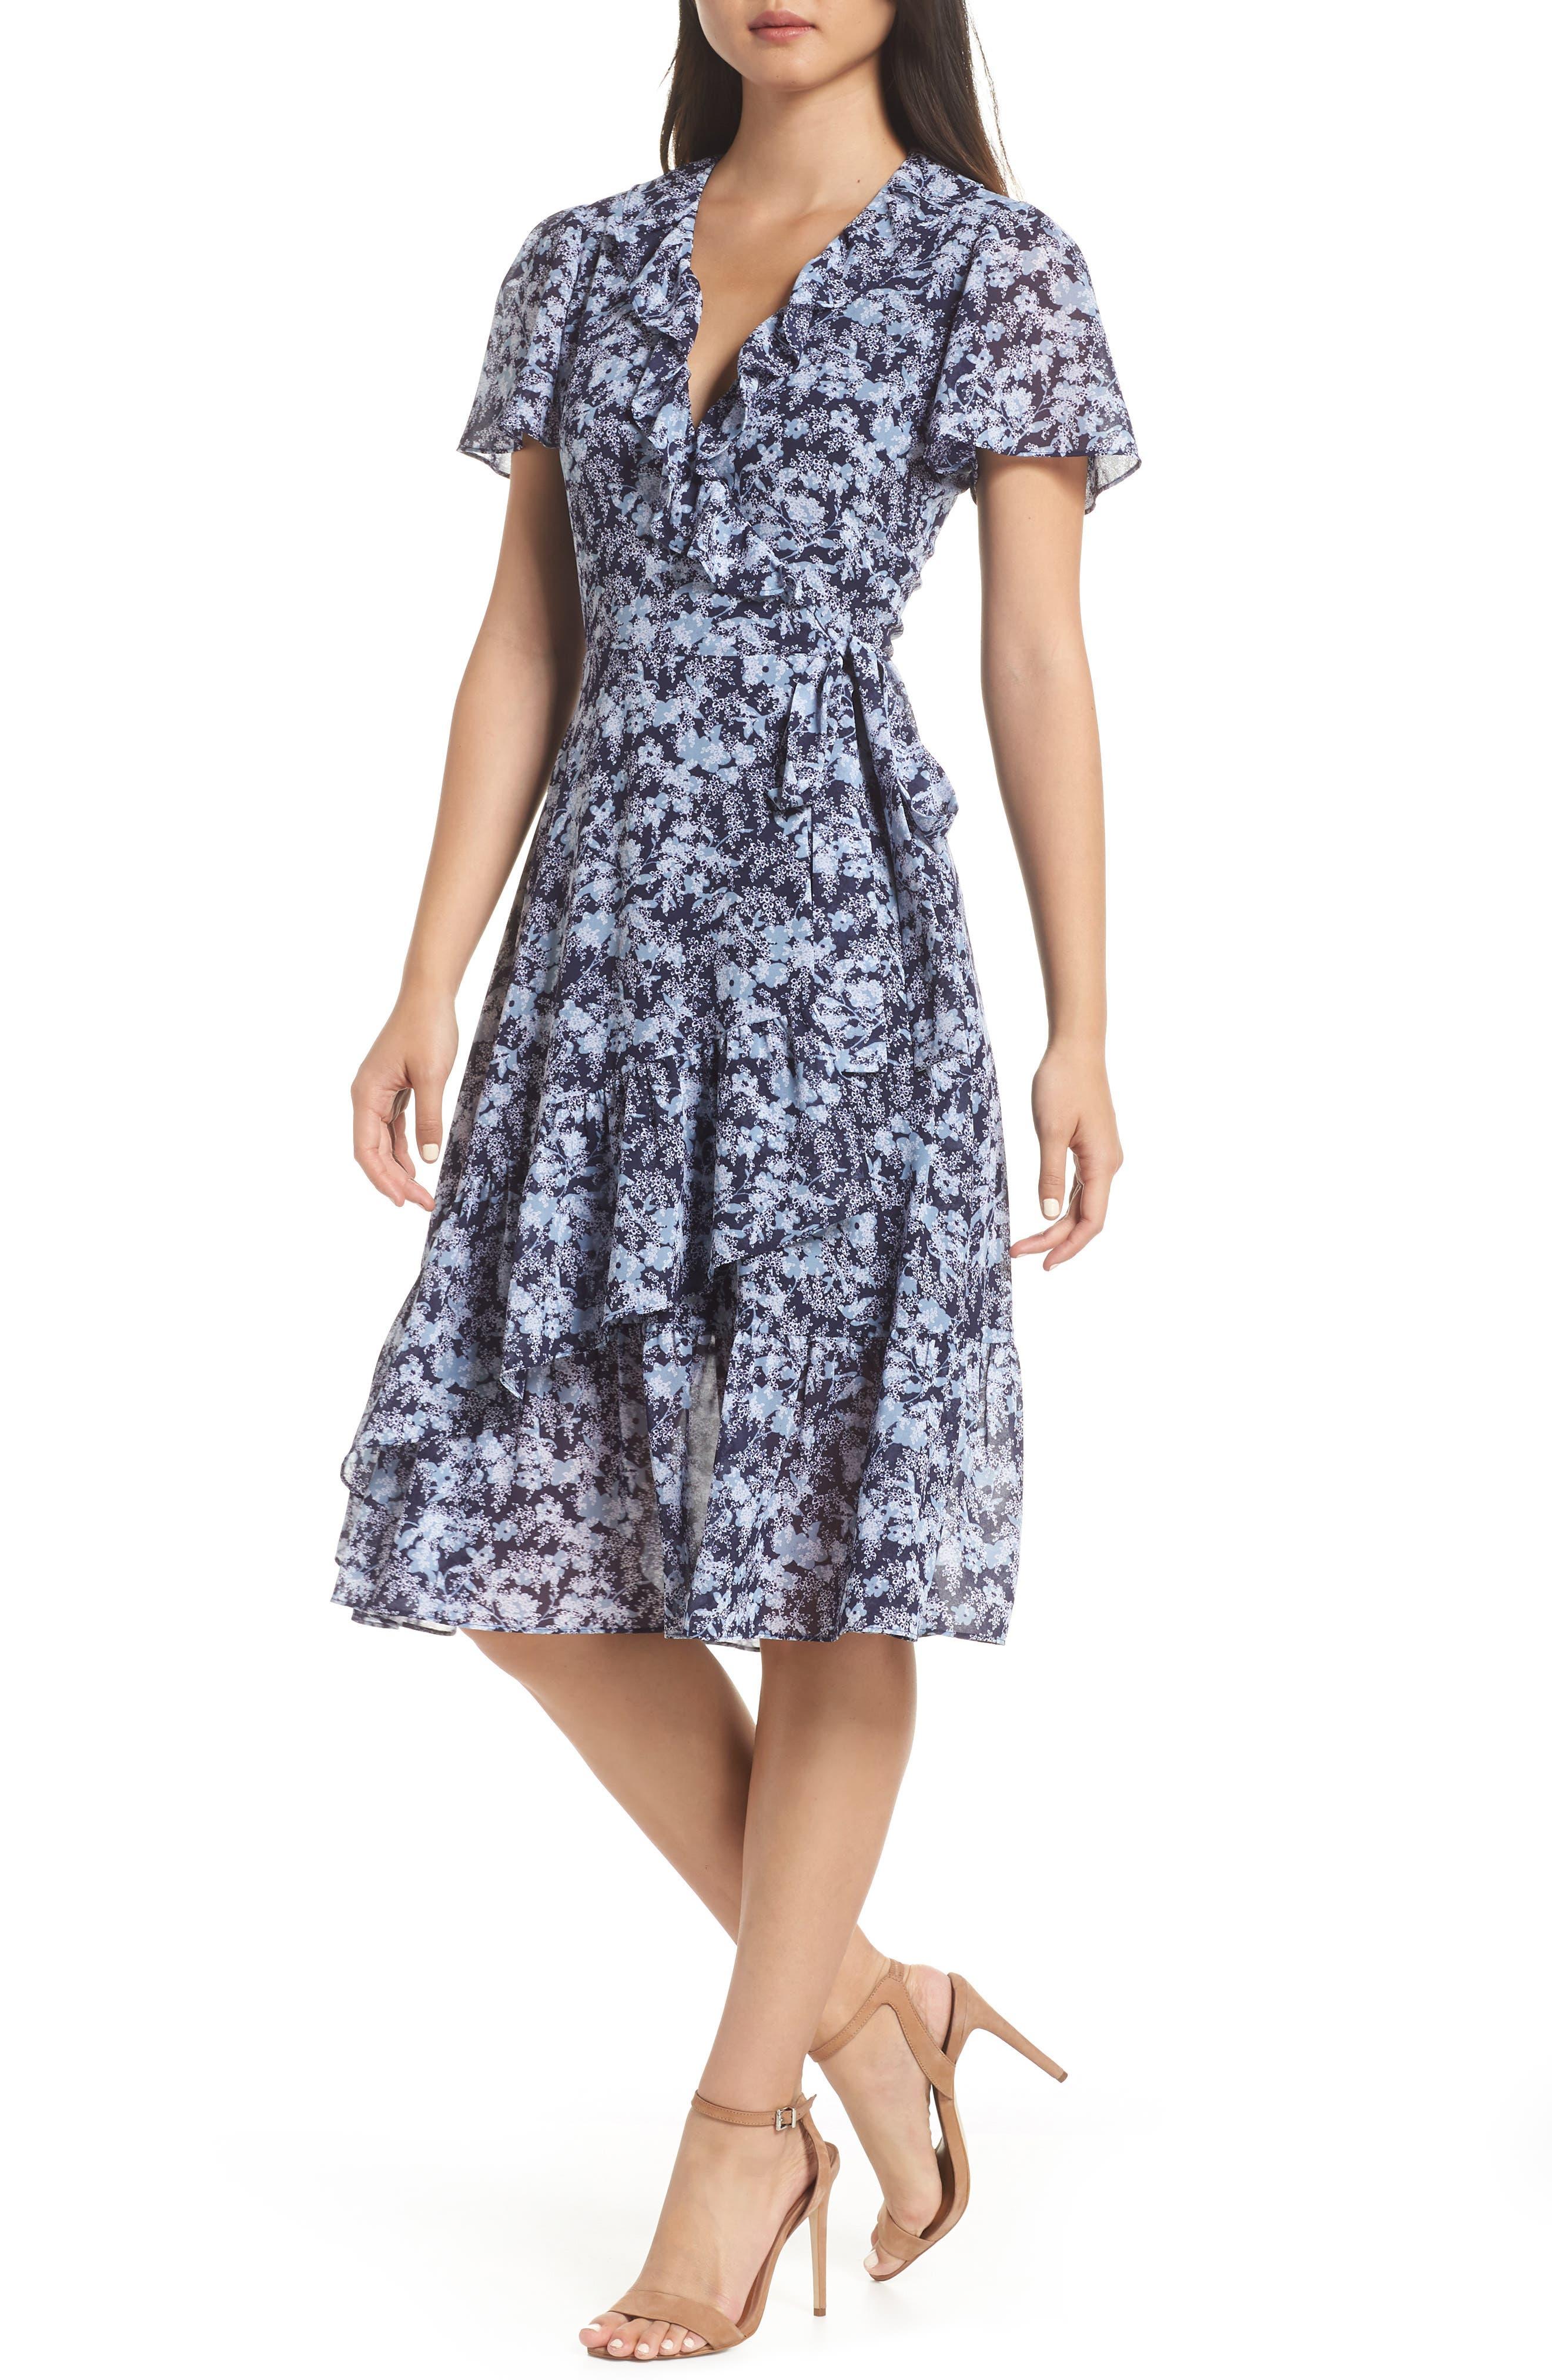 MICHAEL MICHAEL KORS, Ruffle Wrap Dress, Main thumbnail 1, color, TRUE NAVY/CHAMBRAY